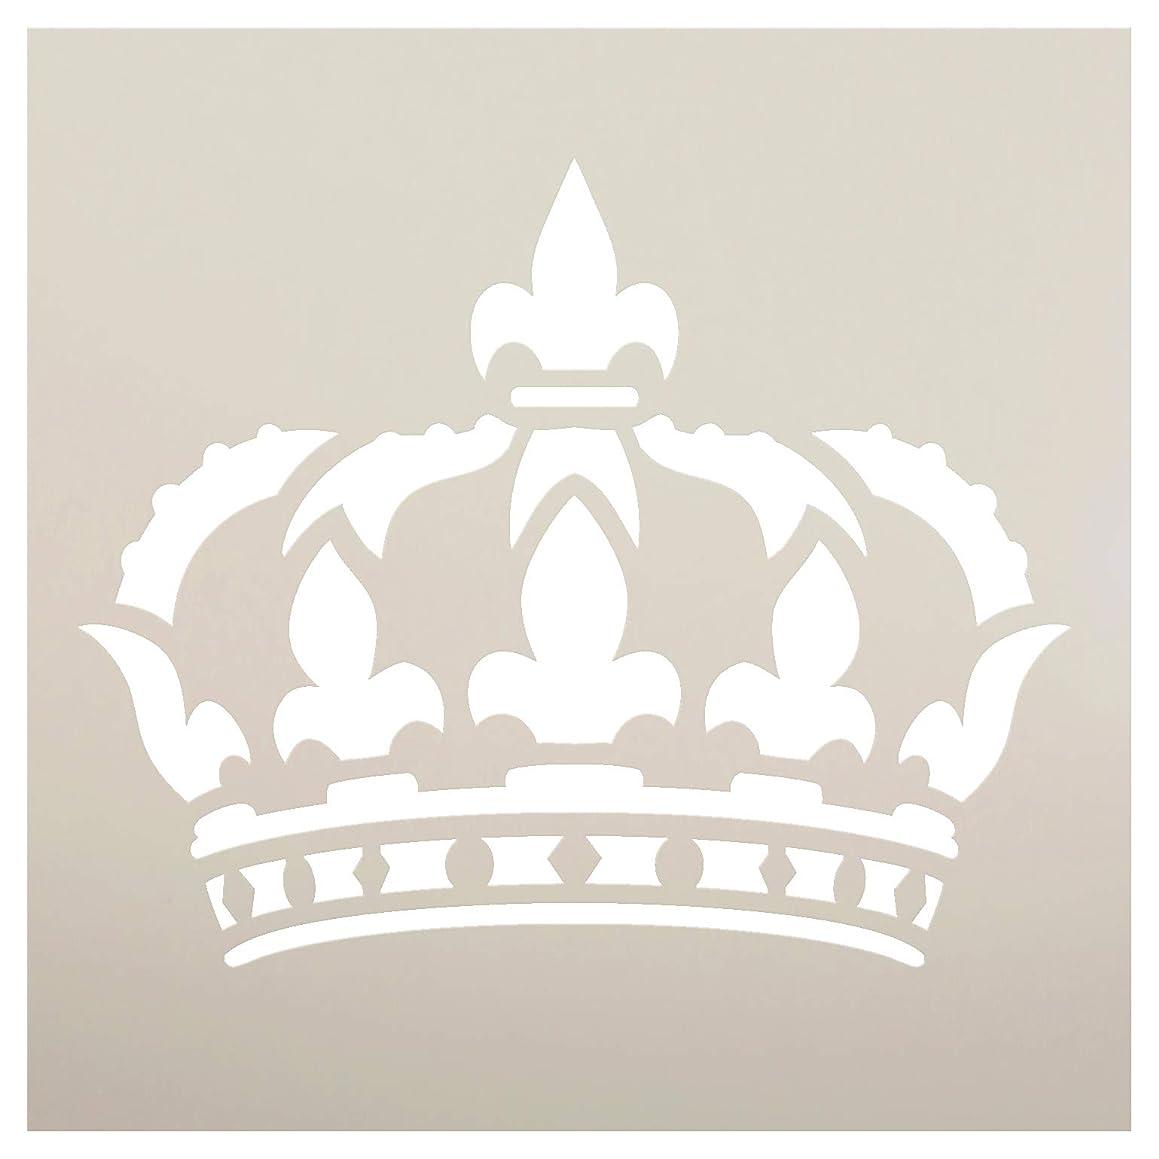 Queens Crown - Art Stencil - STCL1126 by StudioR12 … (9